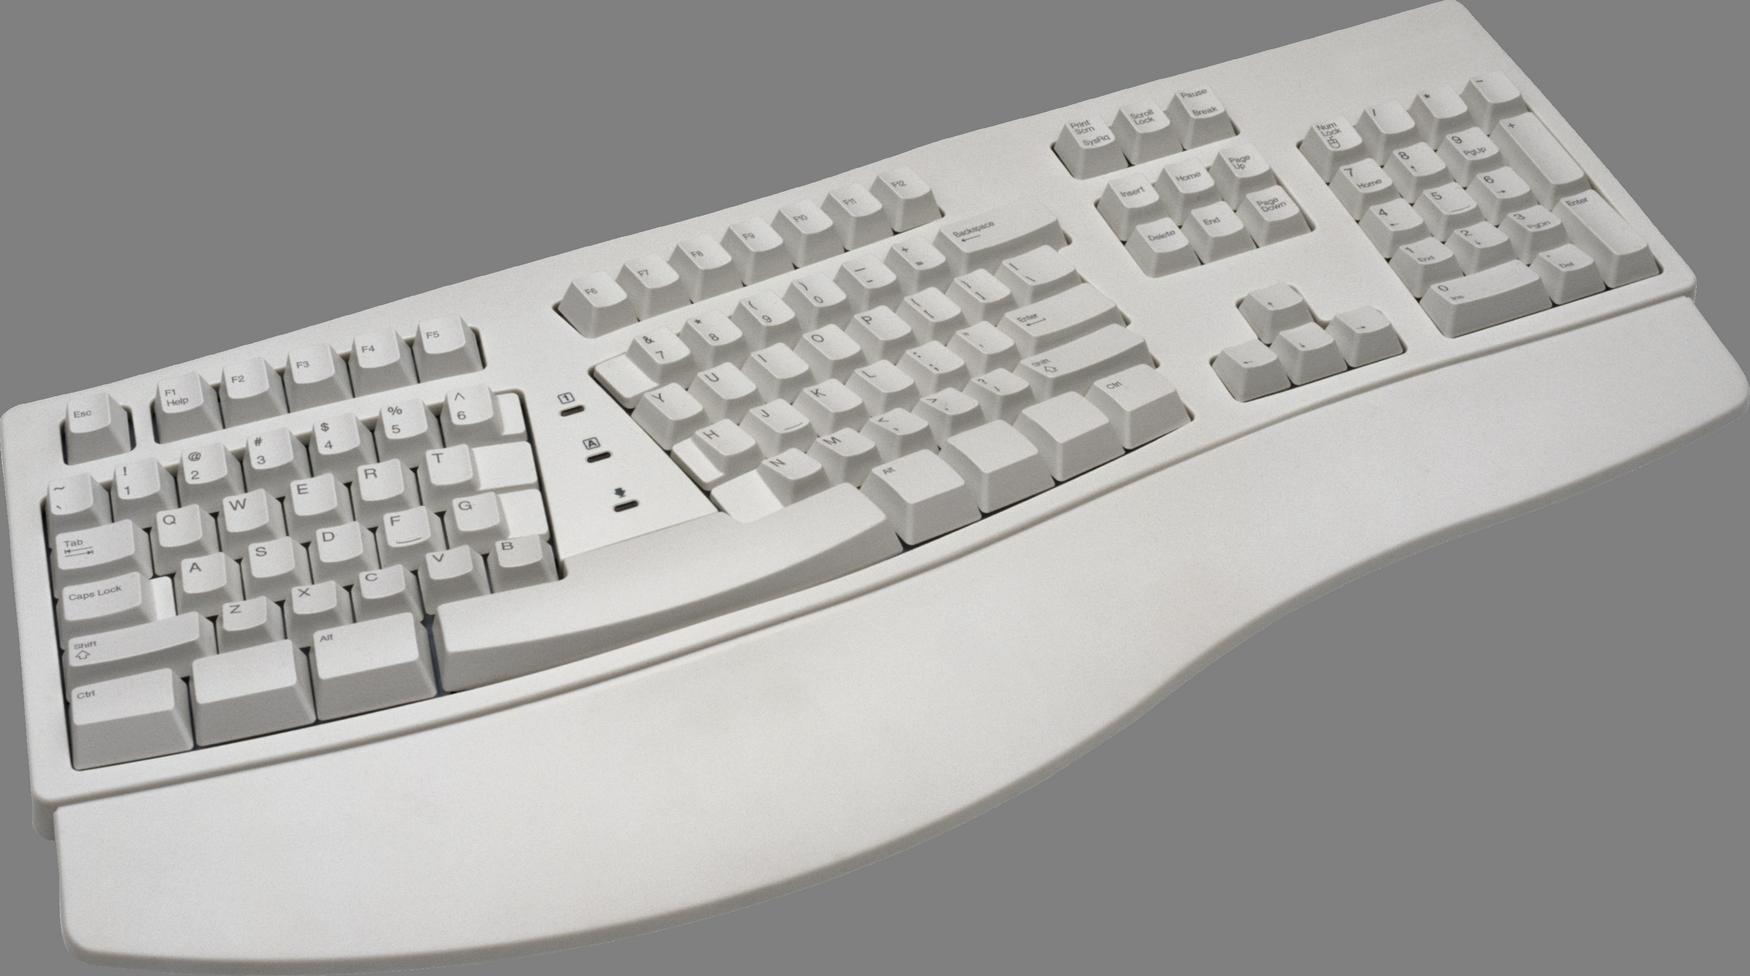 Png image purepng free. White clipart keyboard